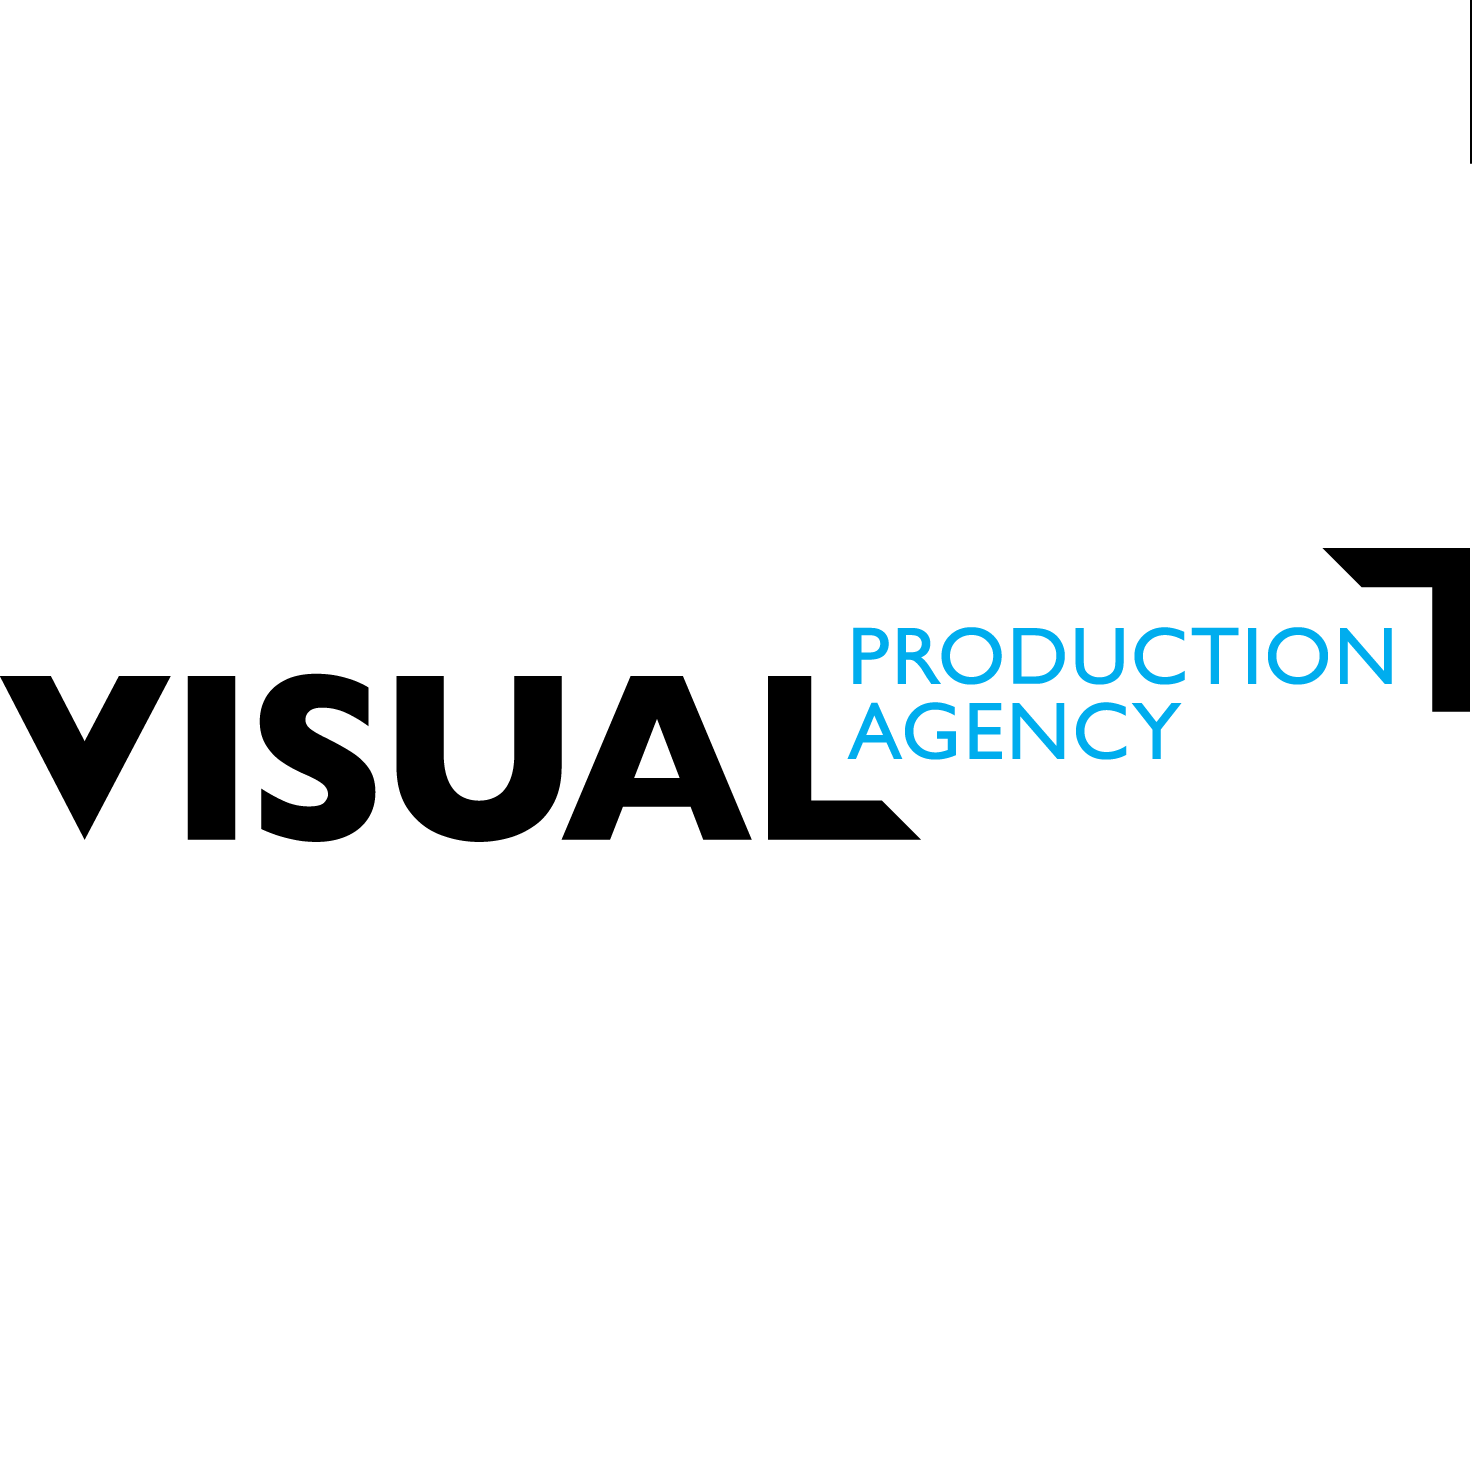 Visual Production